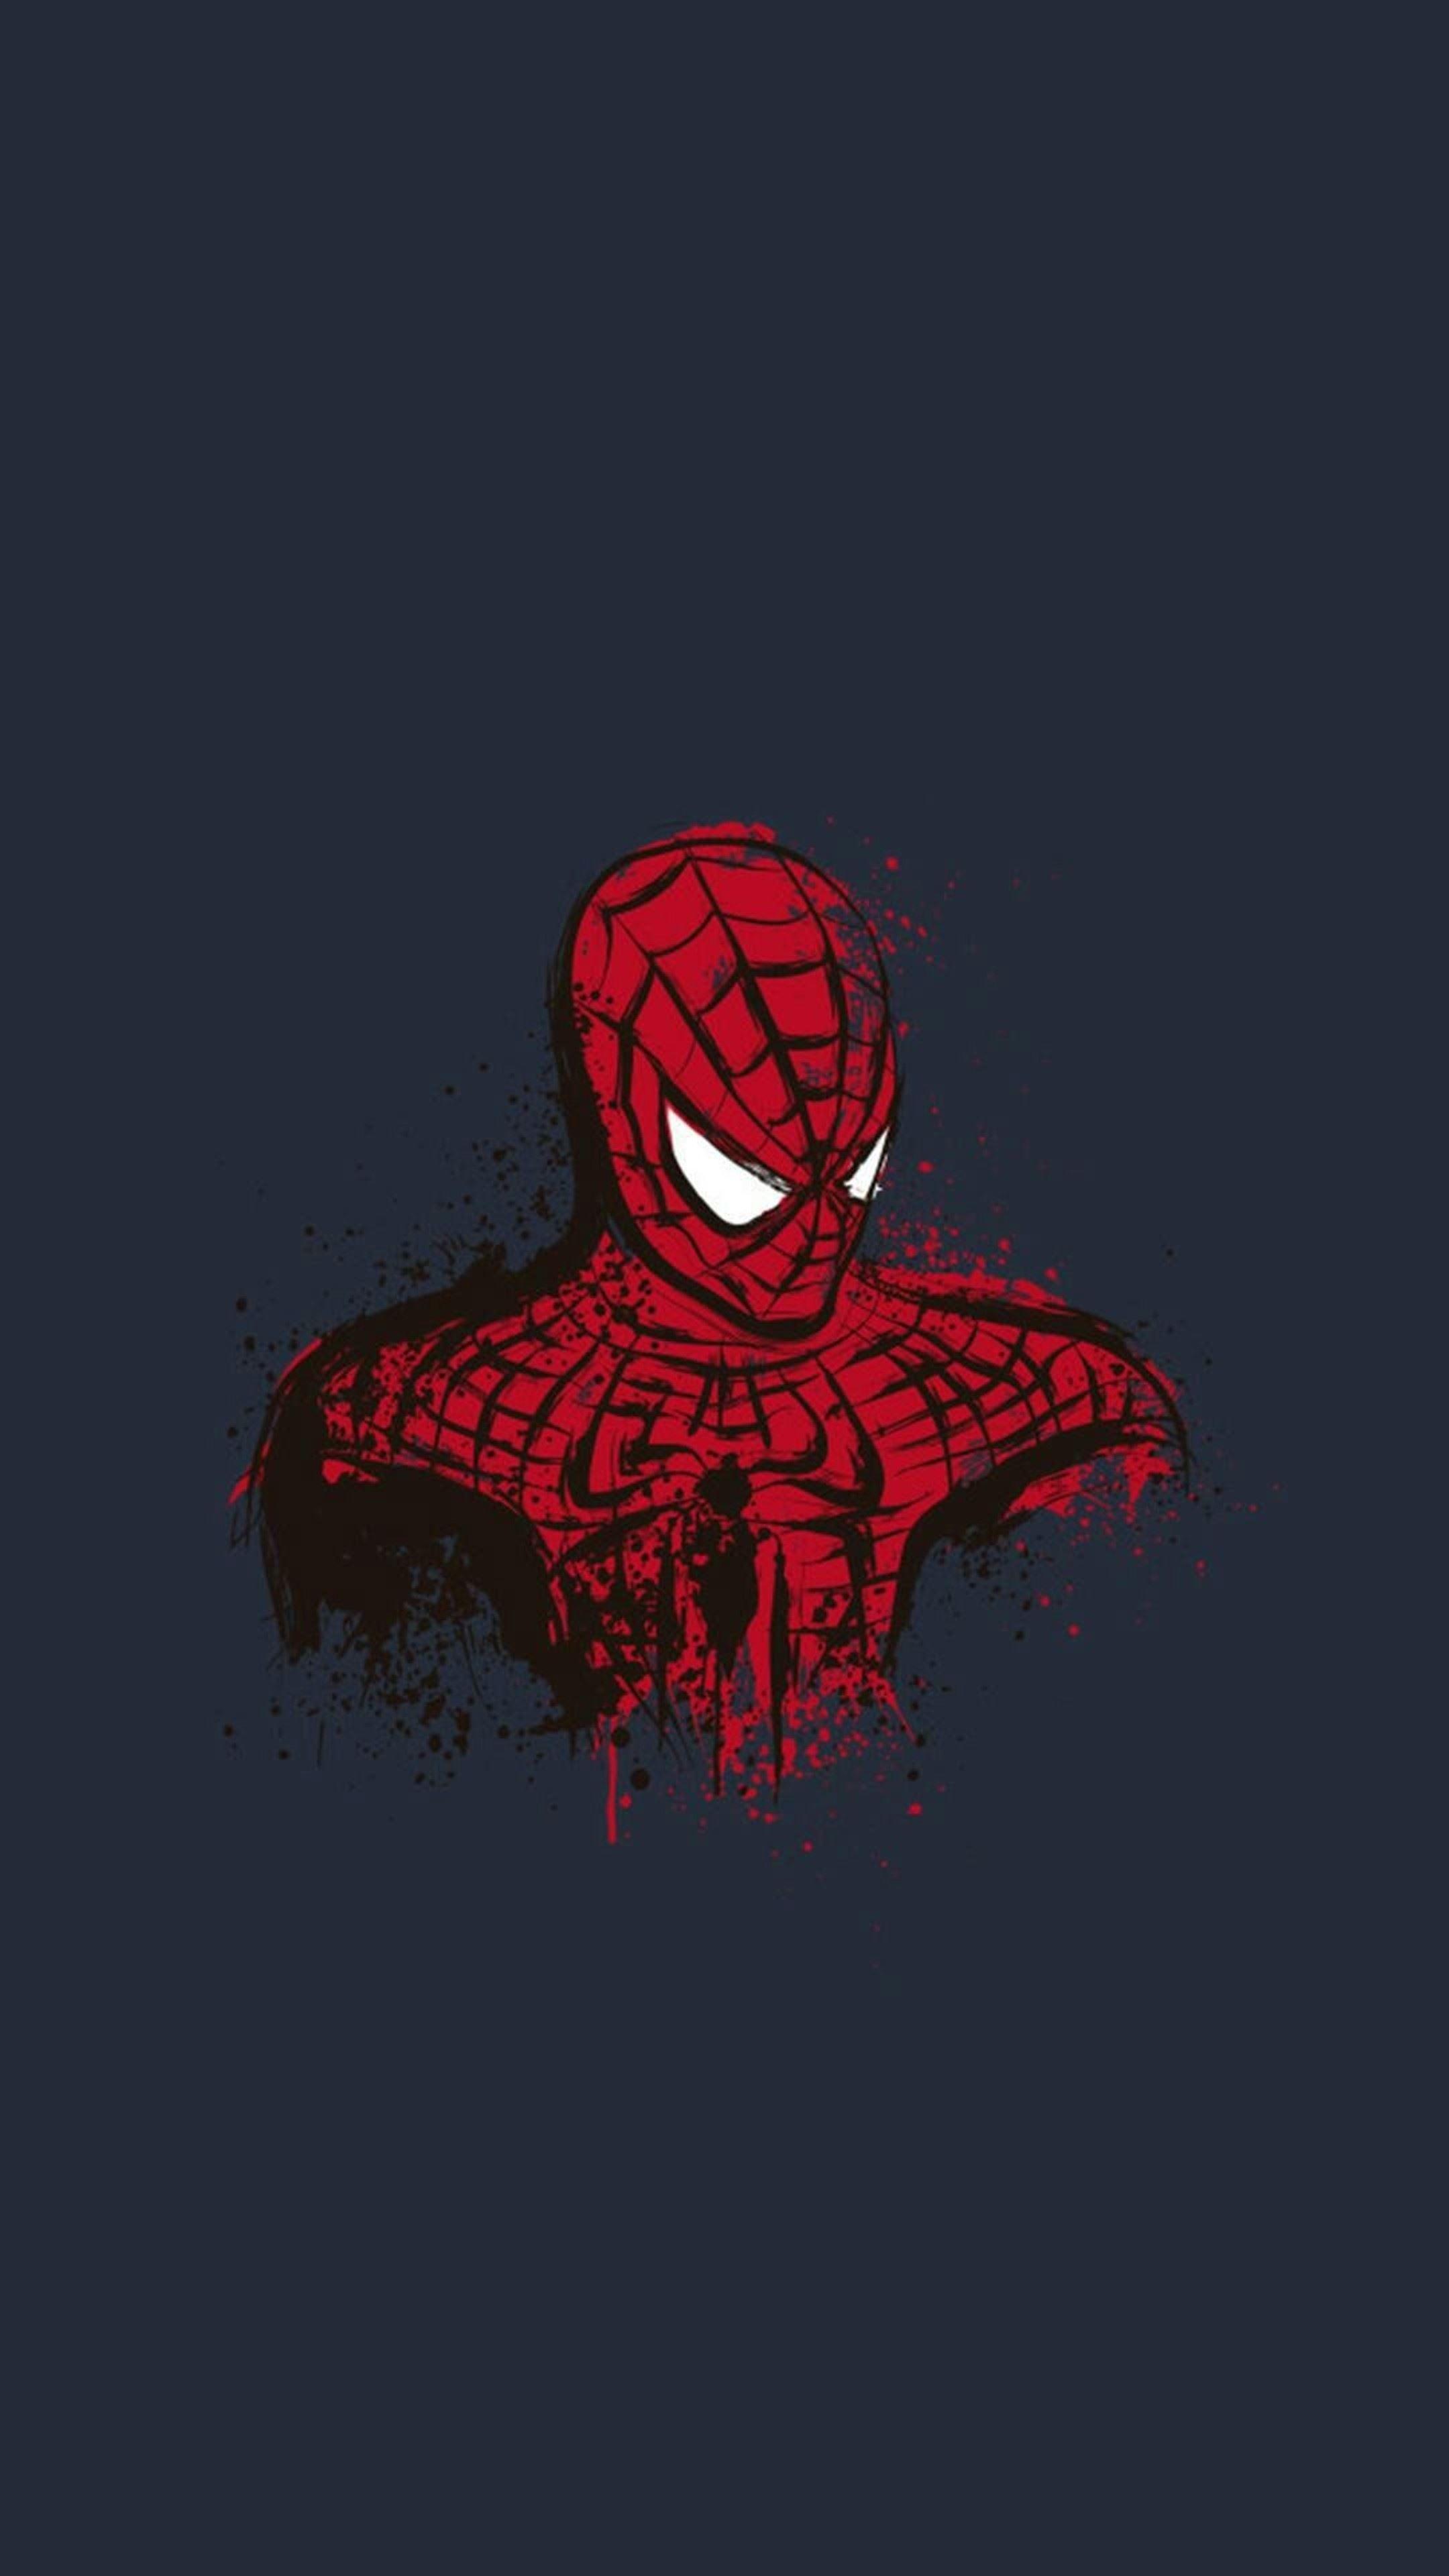 Spiderman Wallpapers Spiderman Art Superhero Wallpaper Avengers Wallpaper